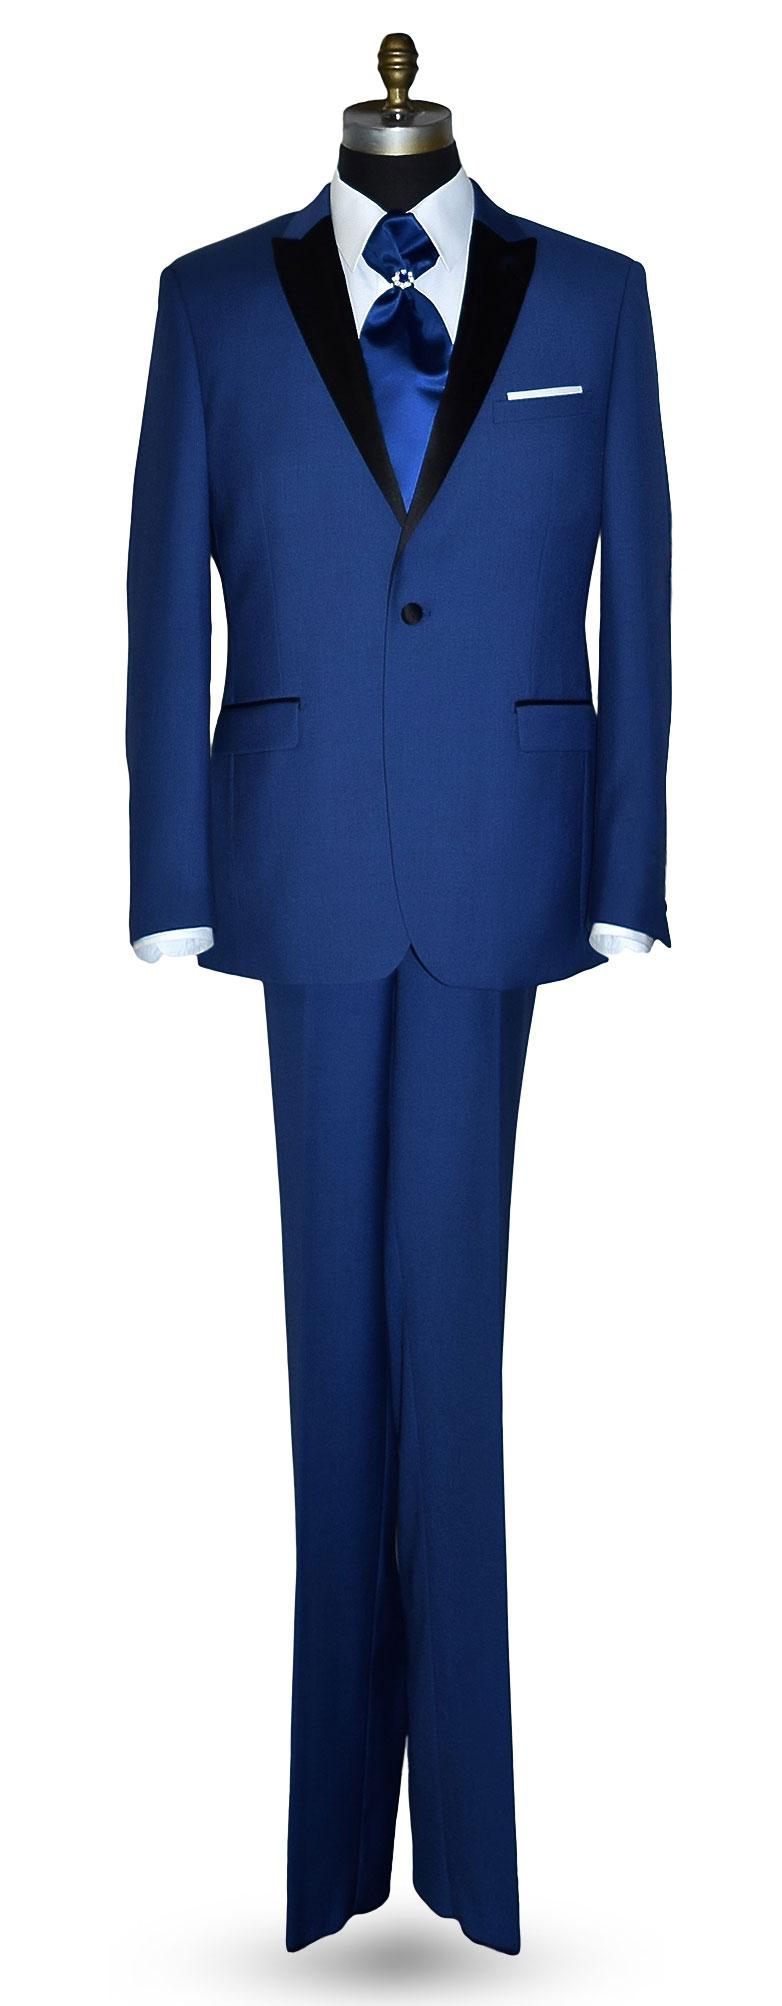 New Blue Tuxedo Coat and Pants Set Only